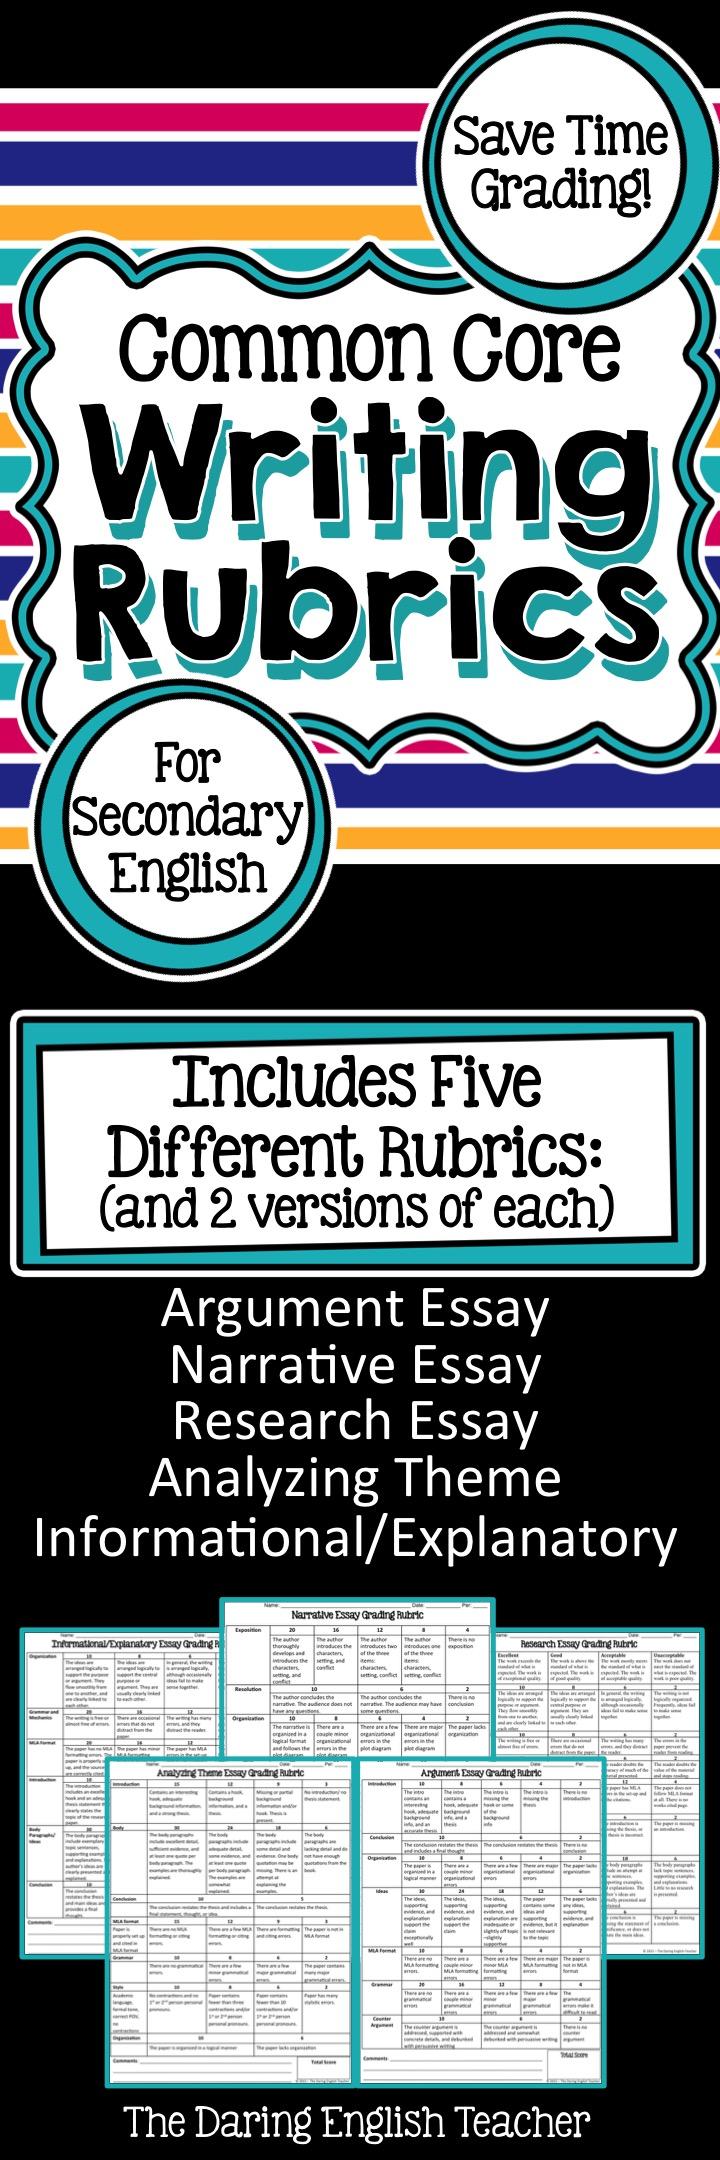 0011 Writing Rubrics Packet for secondary English Teaching